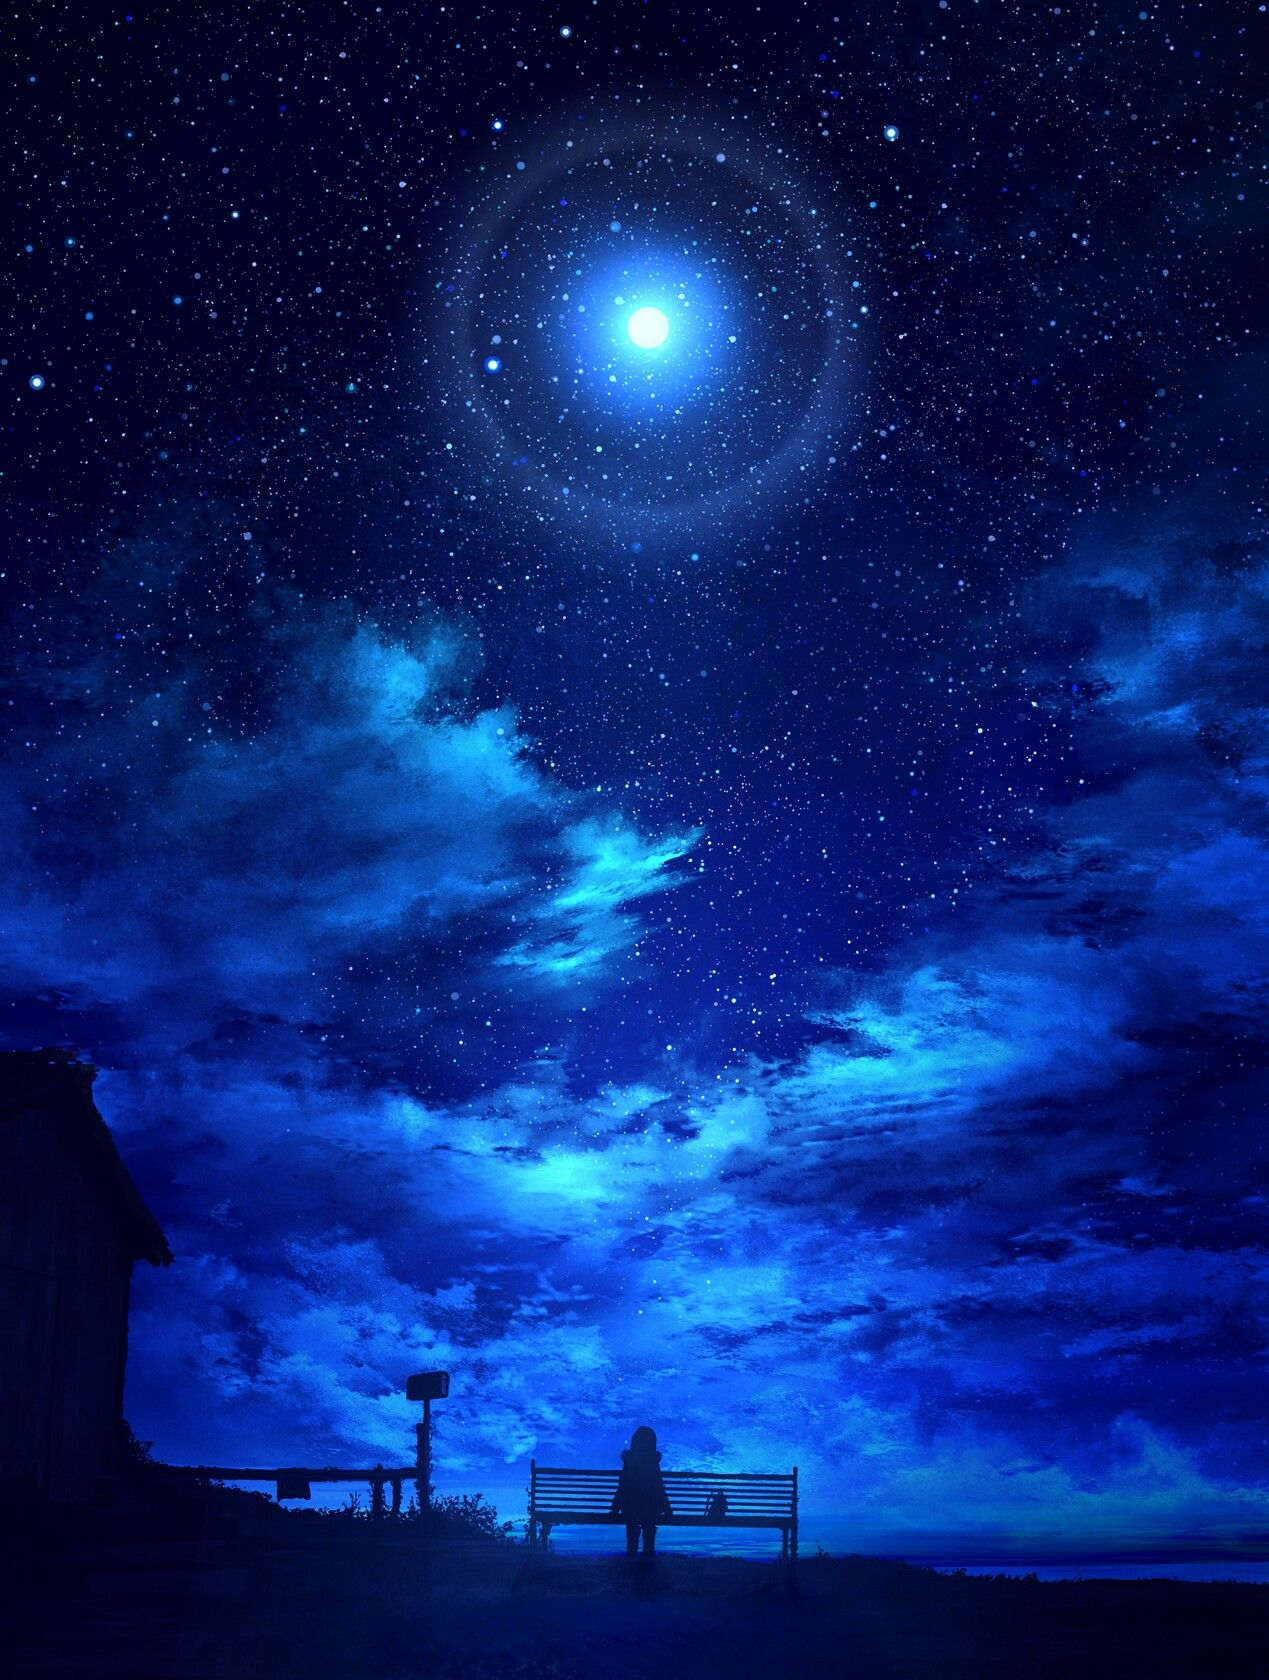 Starry sky, Lonely girl Anime scenery, Night sky